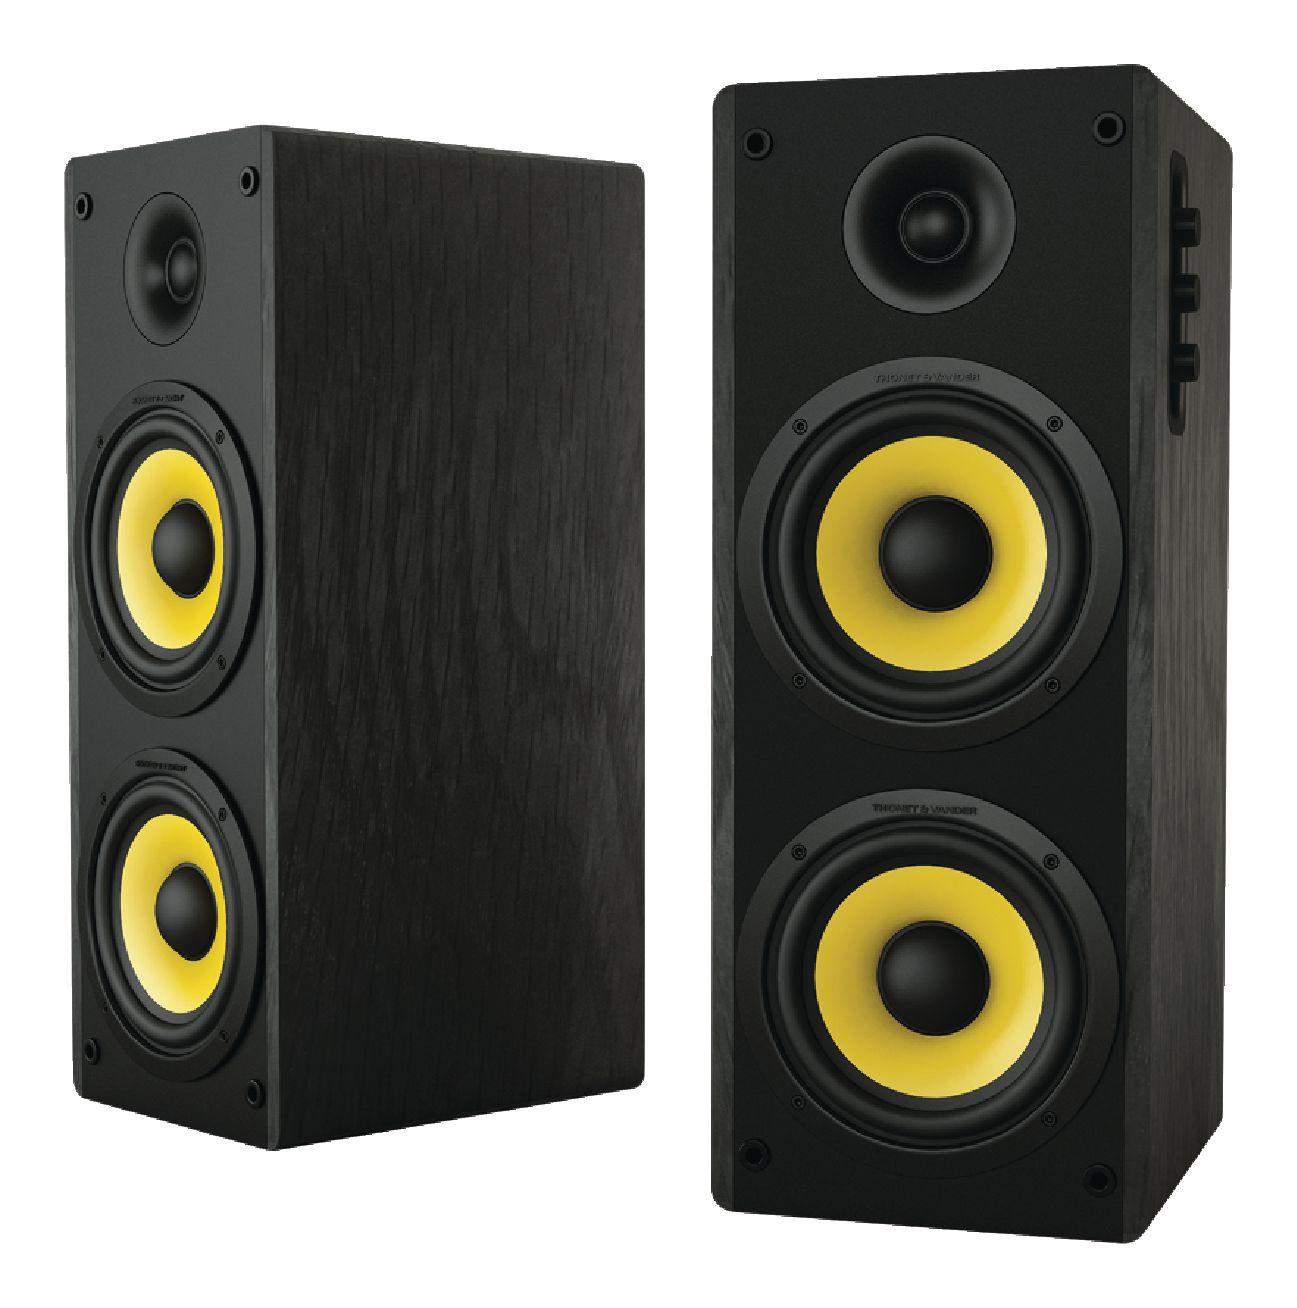 ... TH-03555BL   Thonet   Vander - Bluetooth Speaker 2.0 Hoch 70 W Black   ... 784e58abf6238